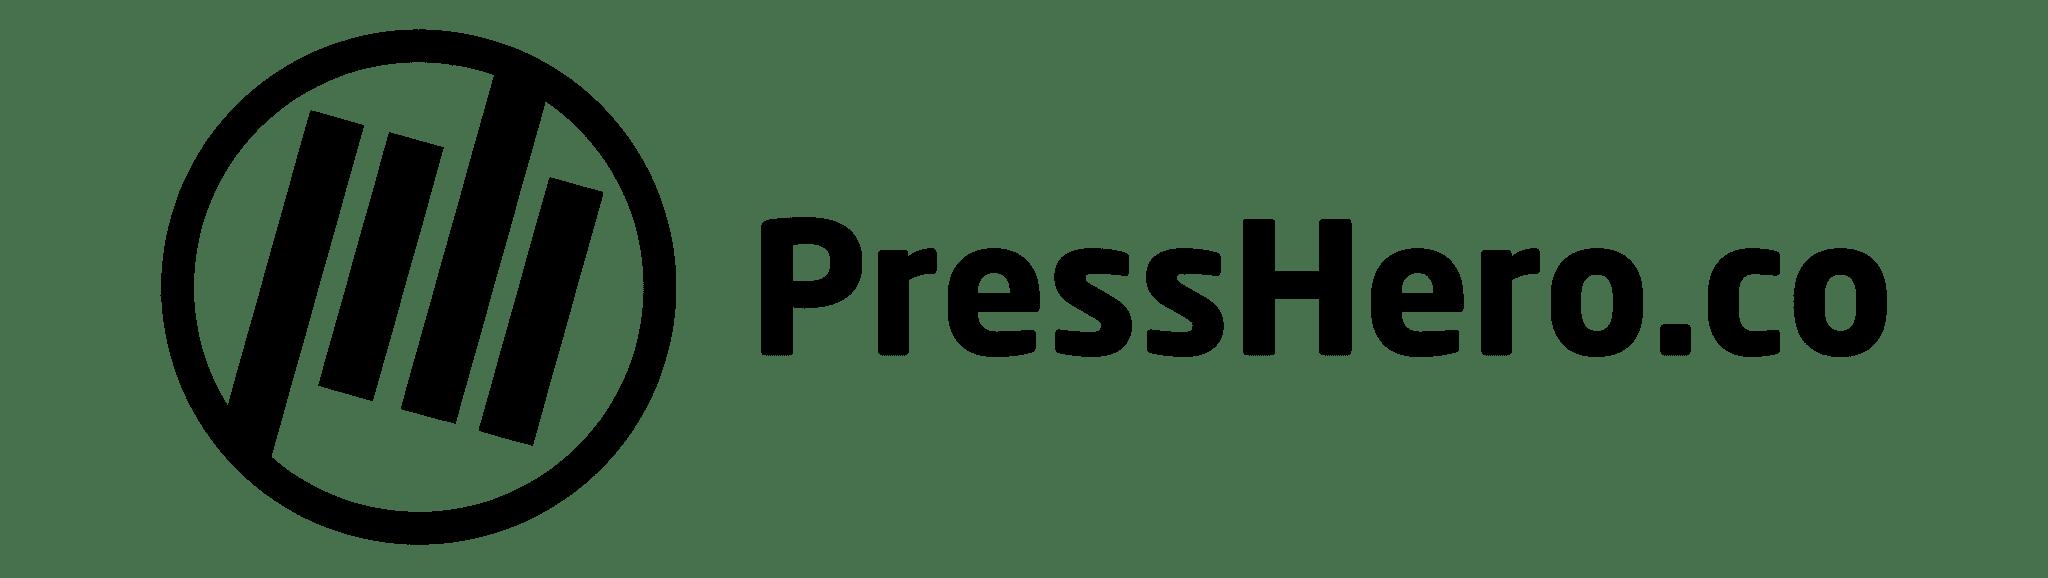 PressHero.co